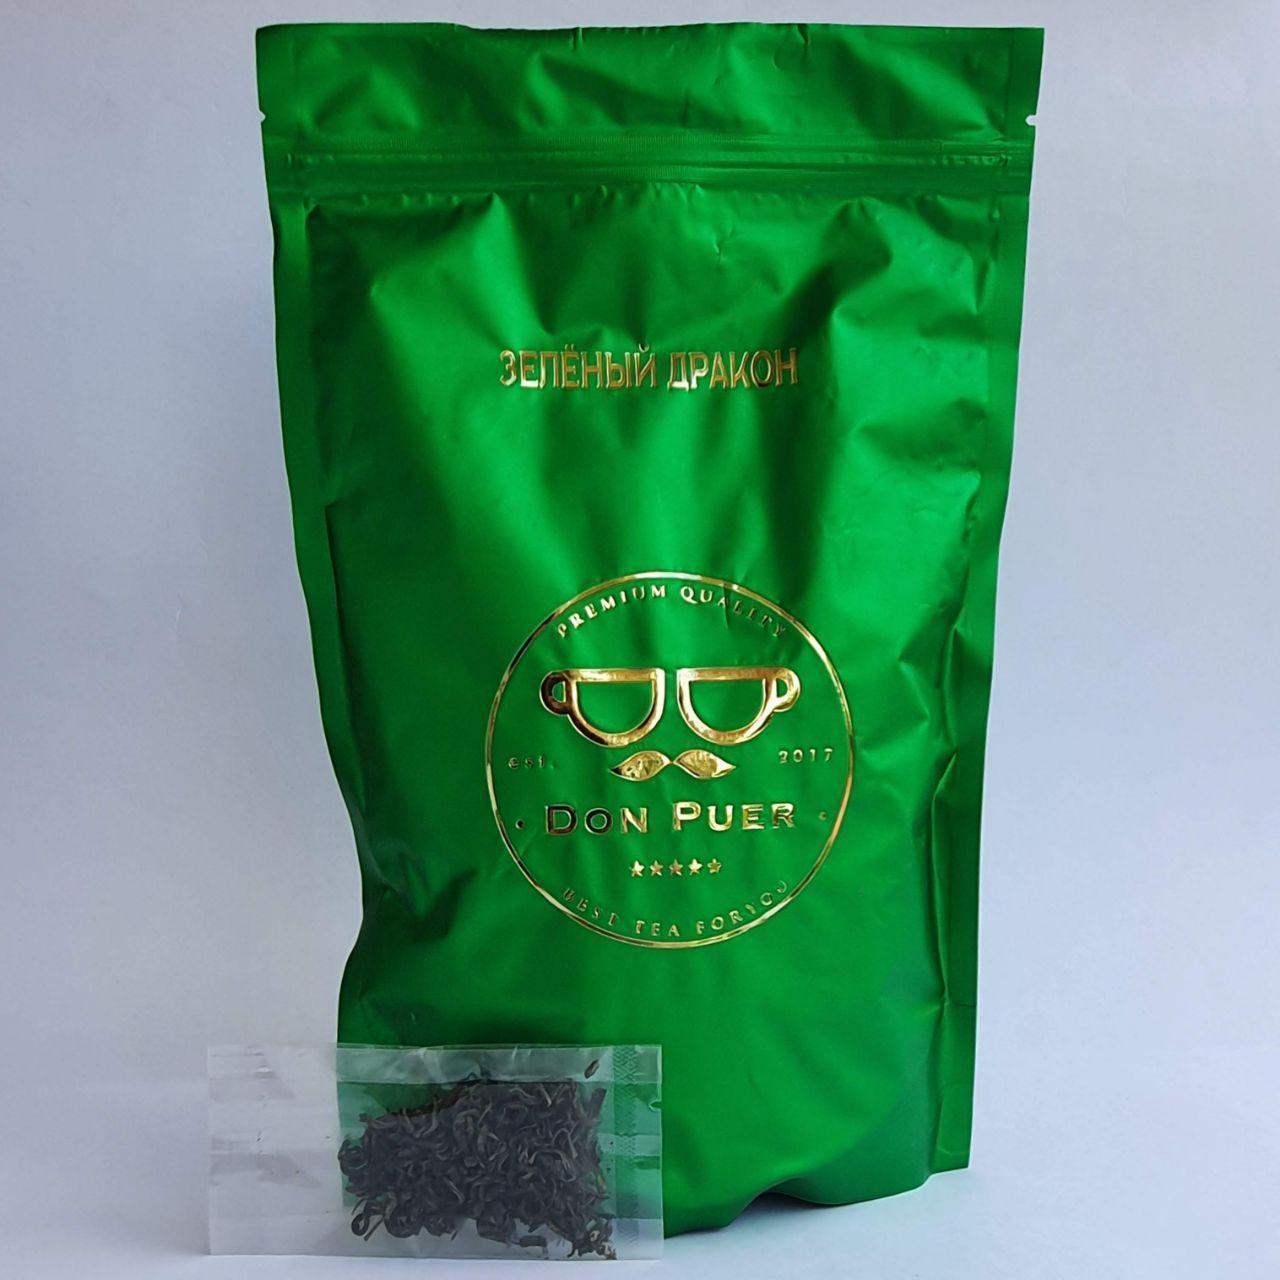 Чай зелёный дракон